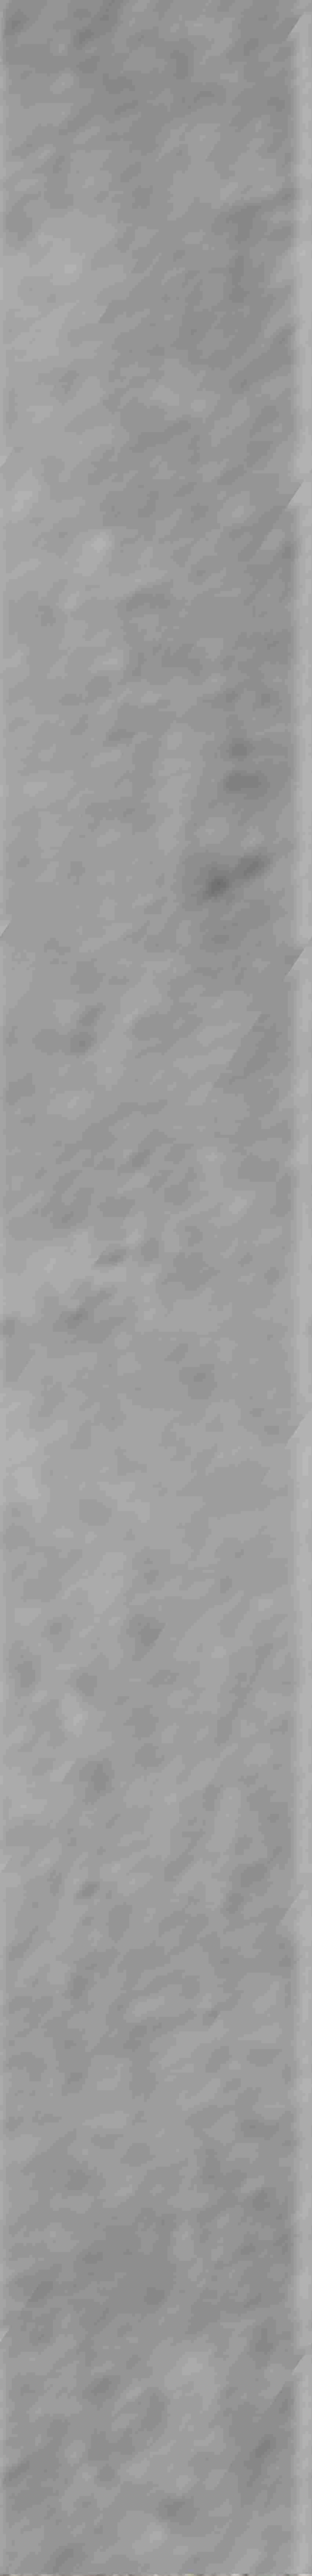 Płytka cokołowa 7,2x59,8 cm  Paradyż Riversand Umbra Cokół Mat